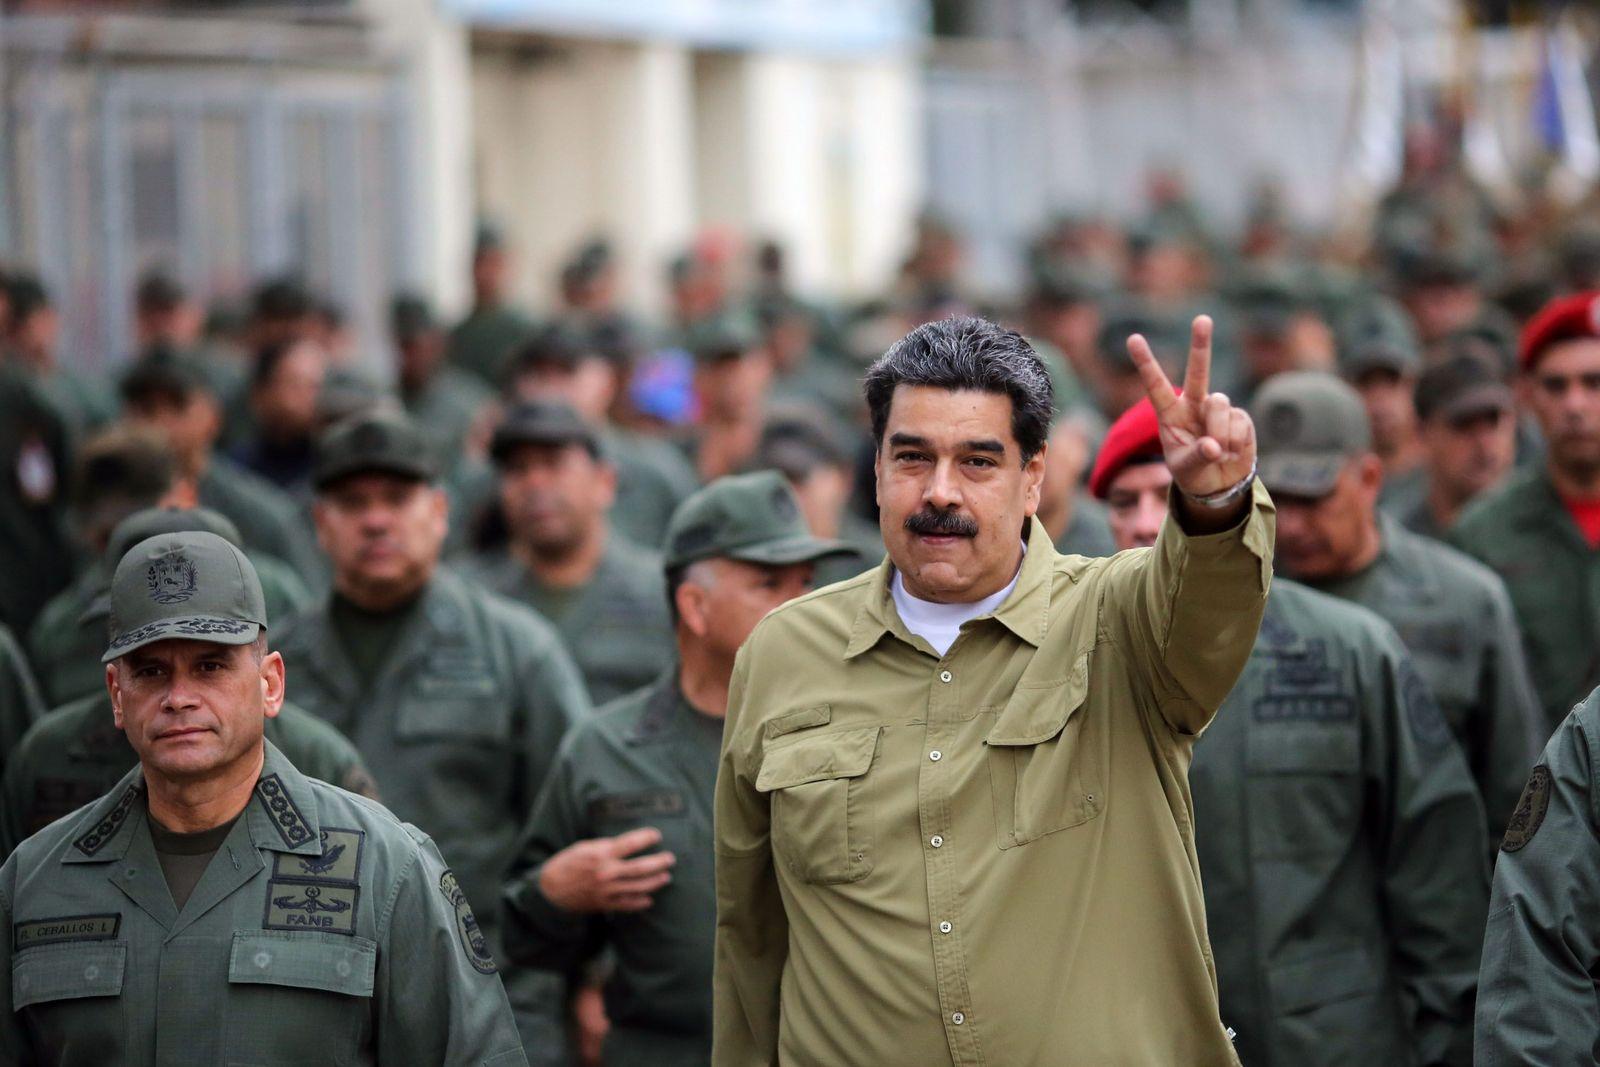 TOPSHOT-VENEZUELA-CRISIS-MILITARY-MADURO